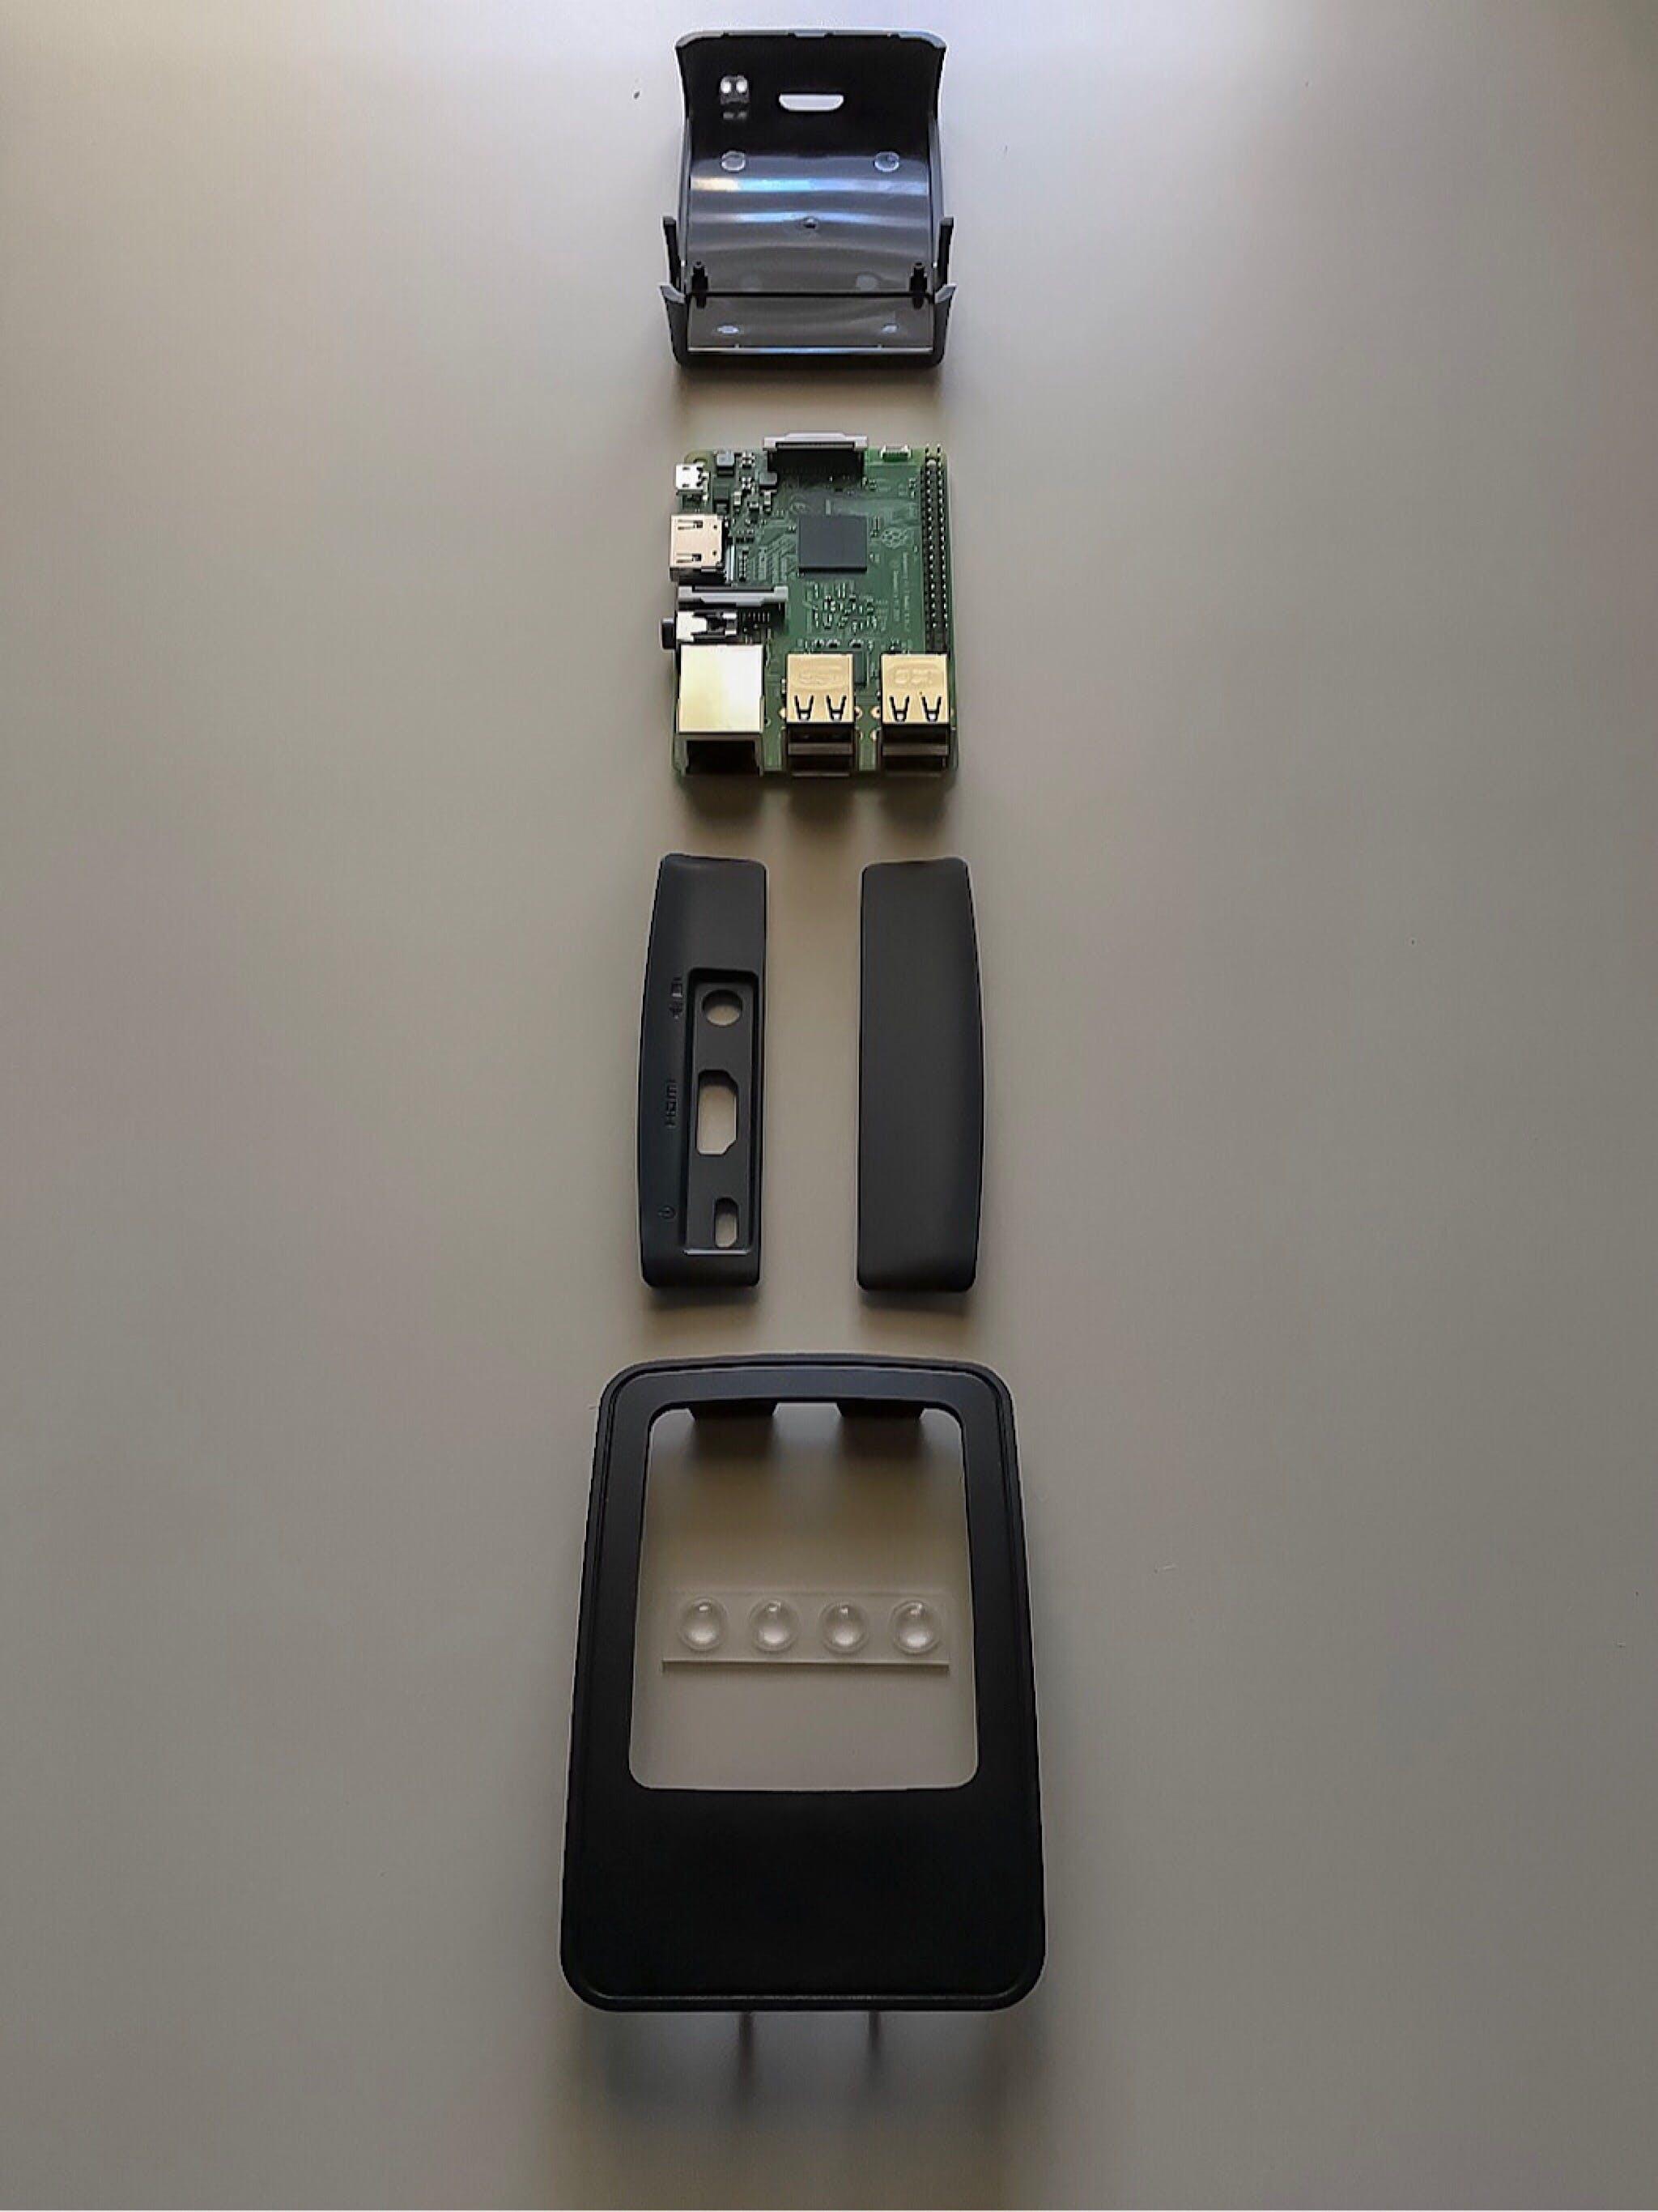 Free stock photo of above, Access point, aluminum, analytics